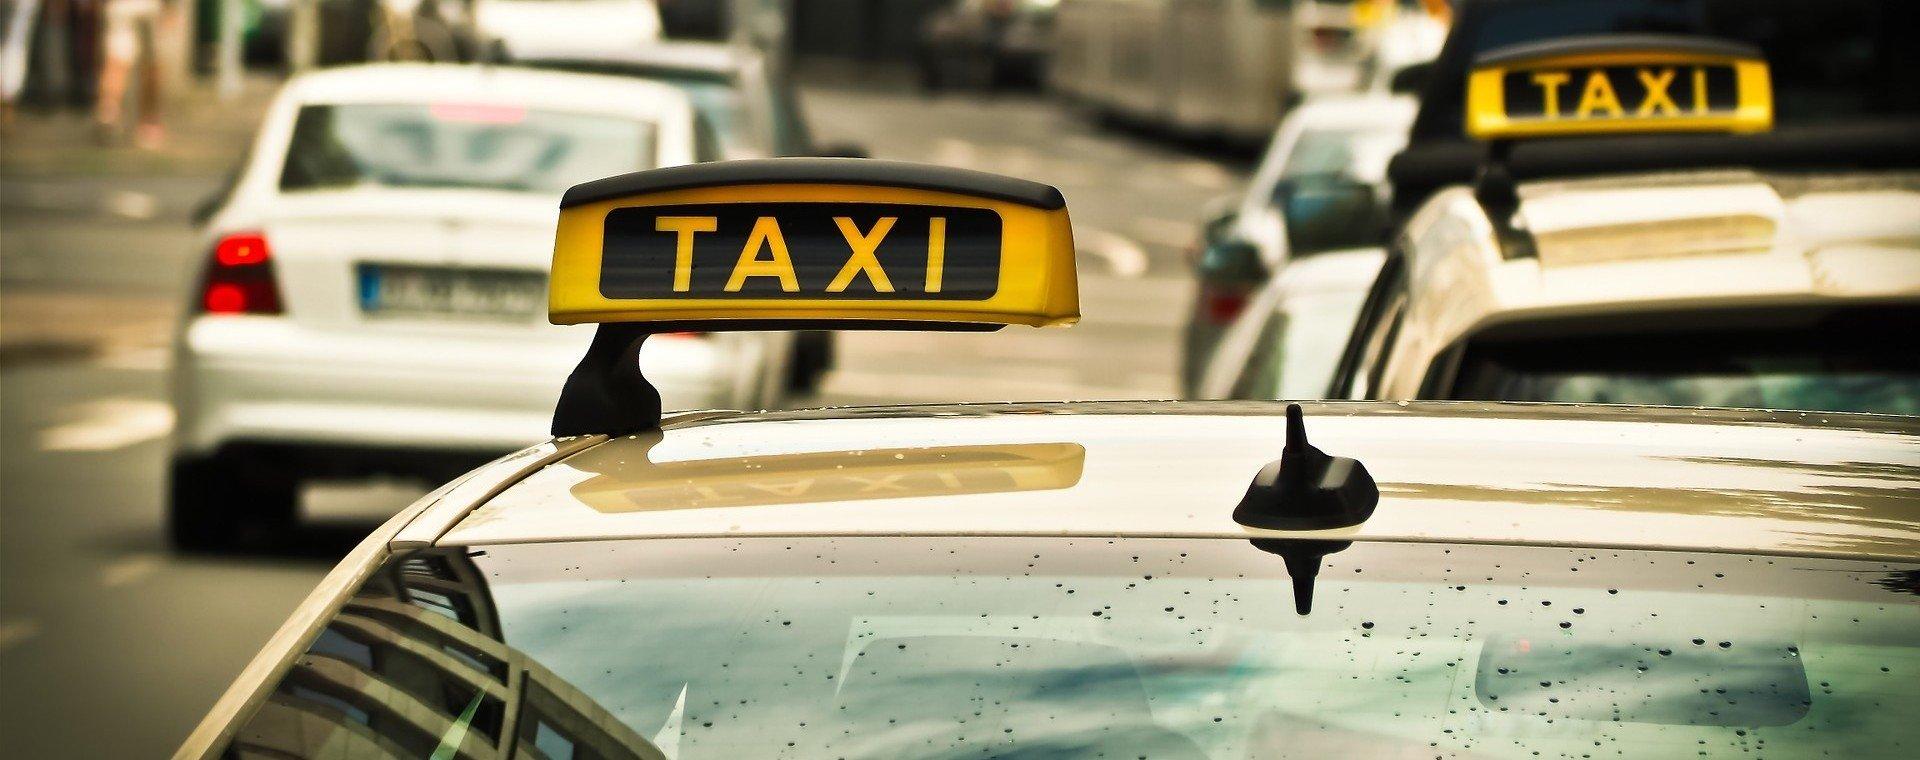 PRIVATE CAB SERVICE - Collection